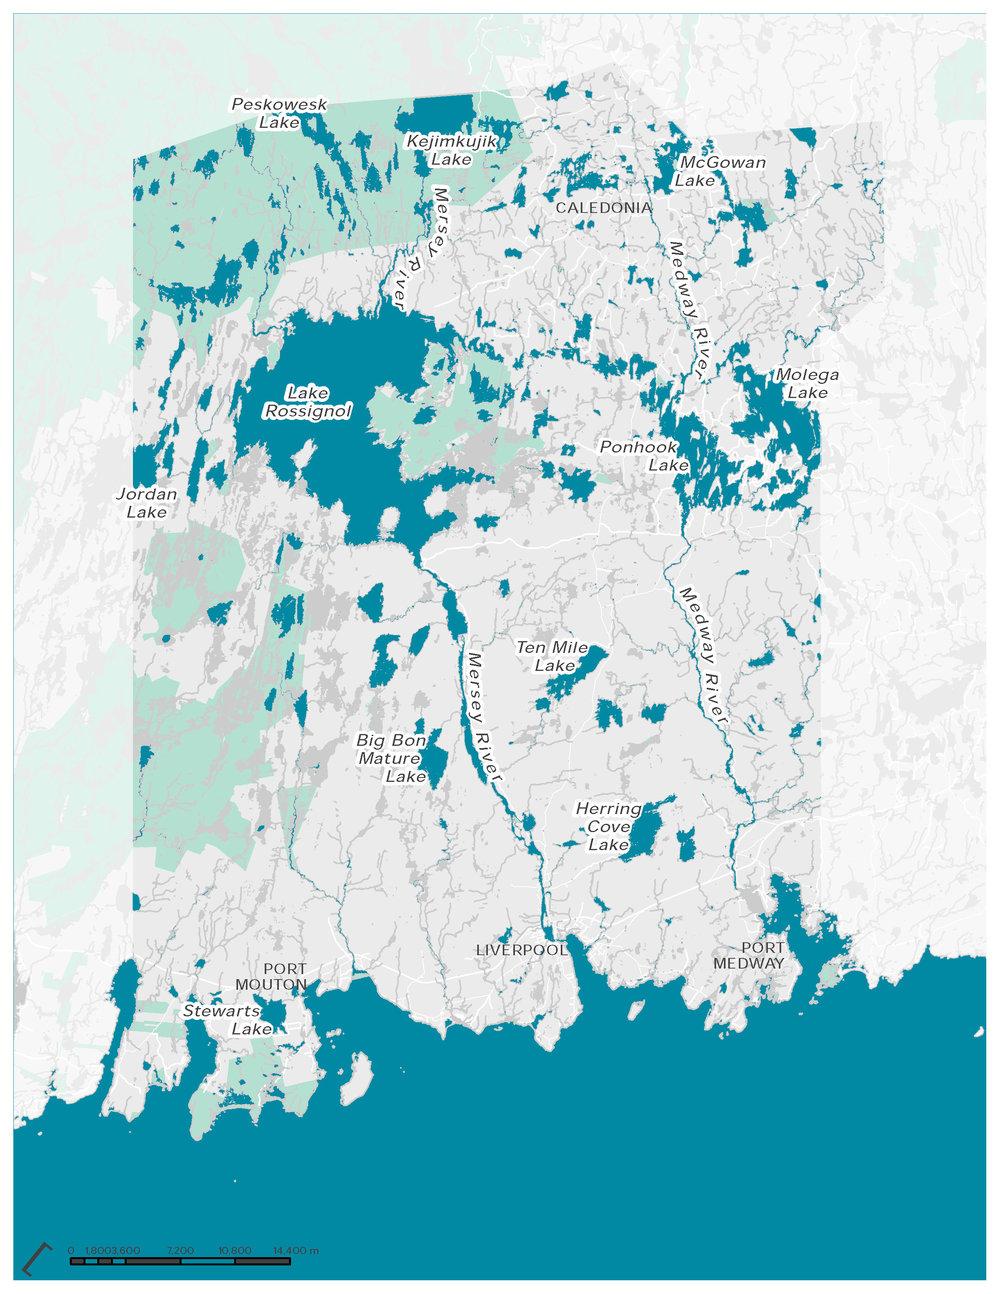 Watercourses and Coastline